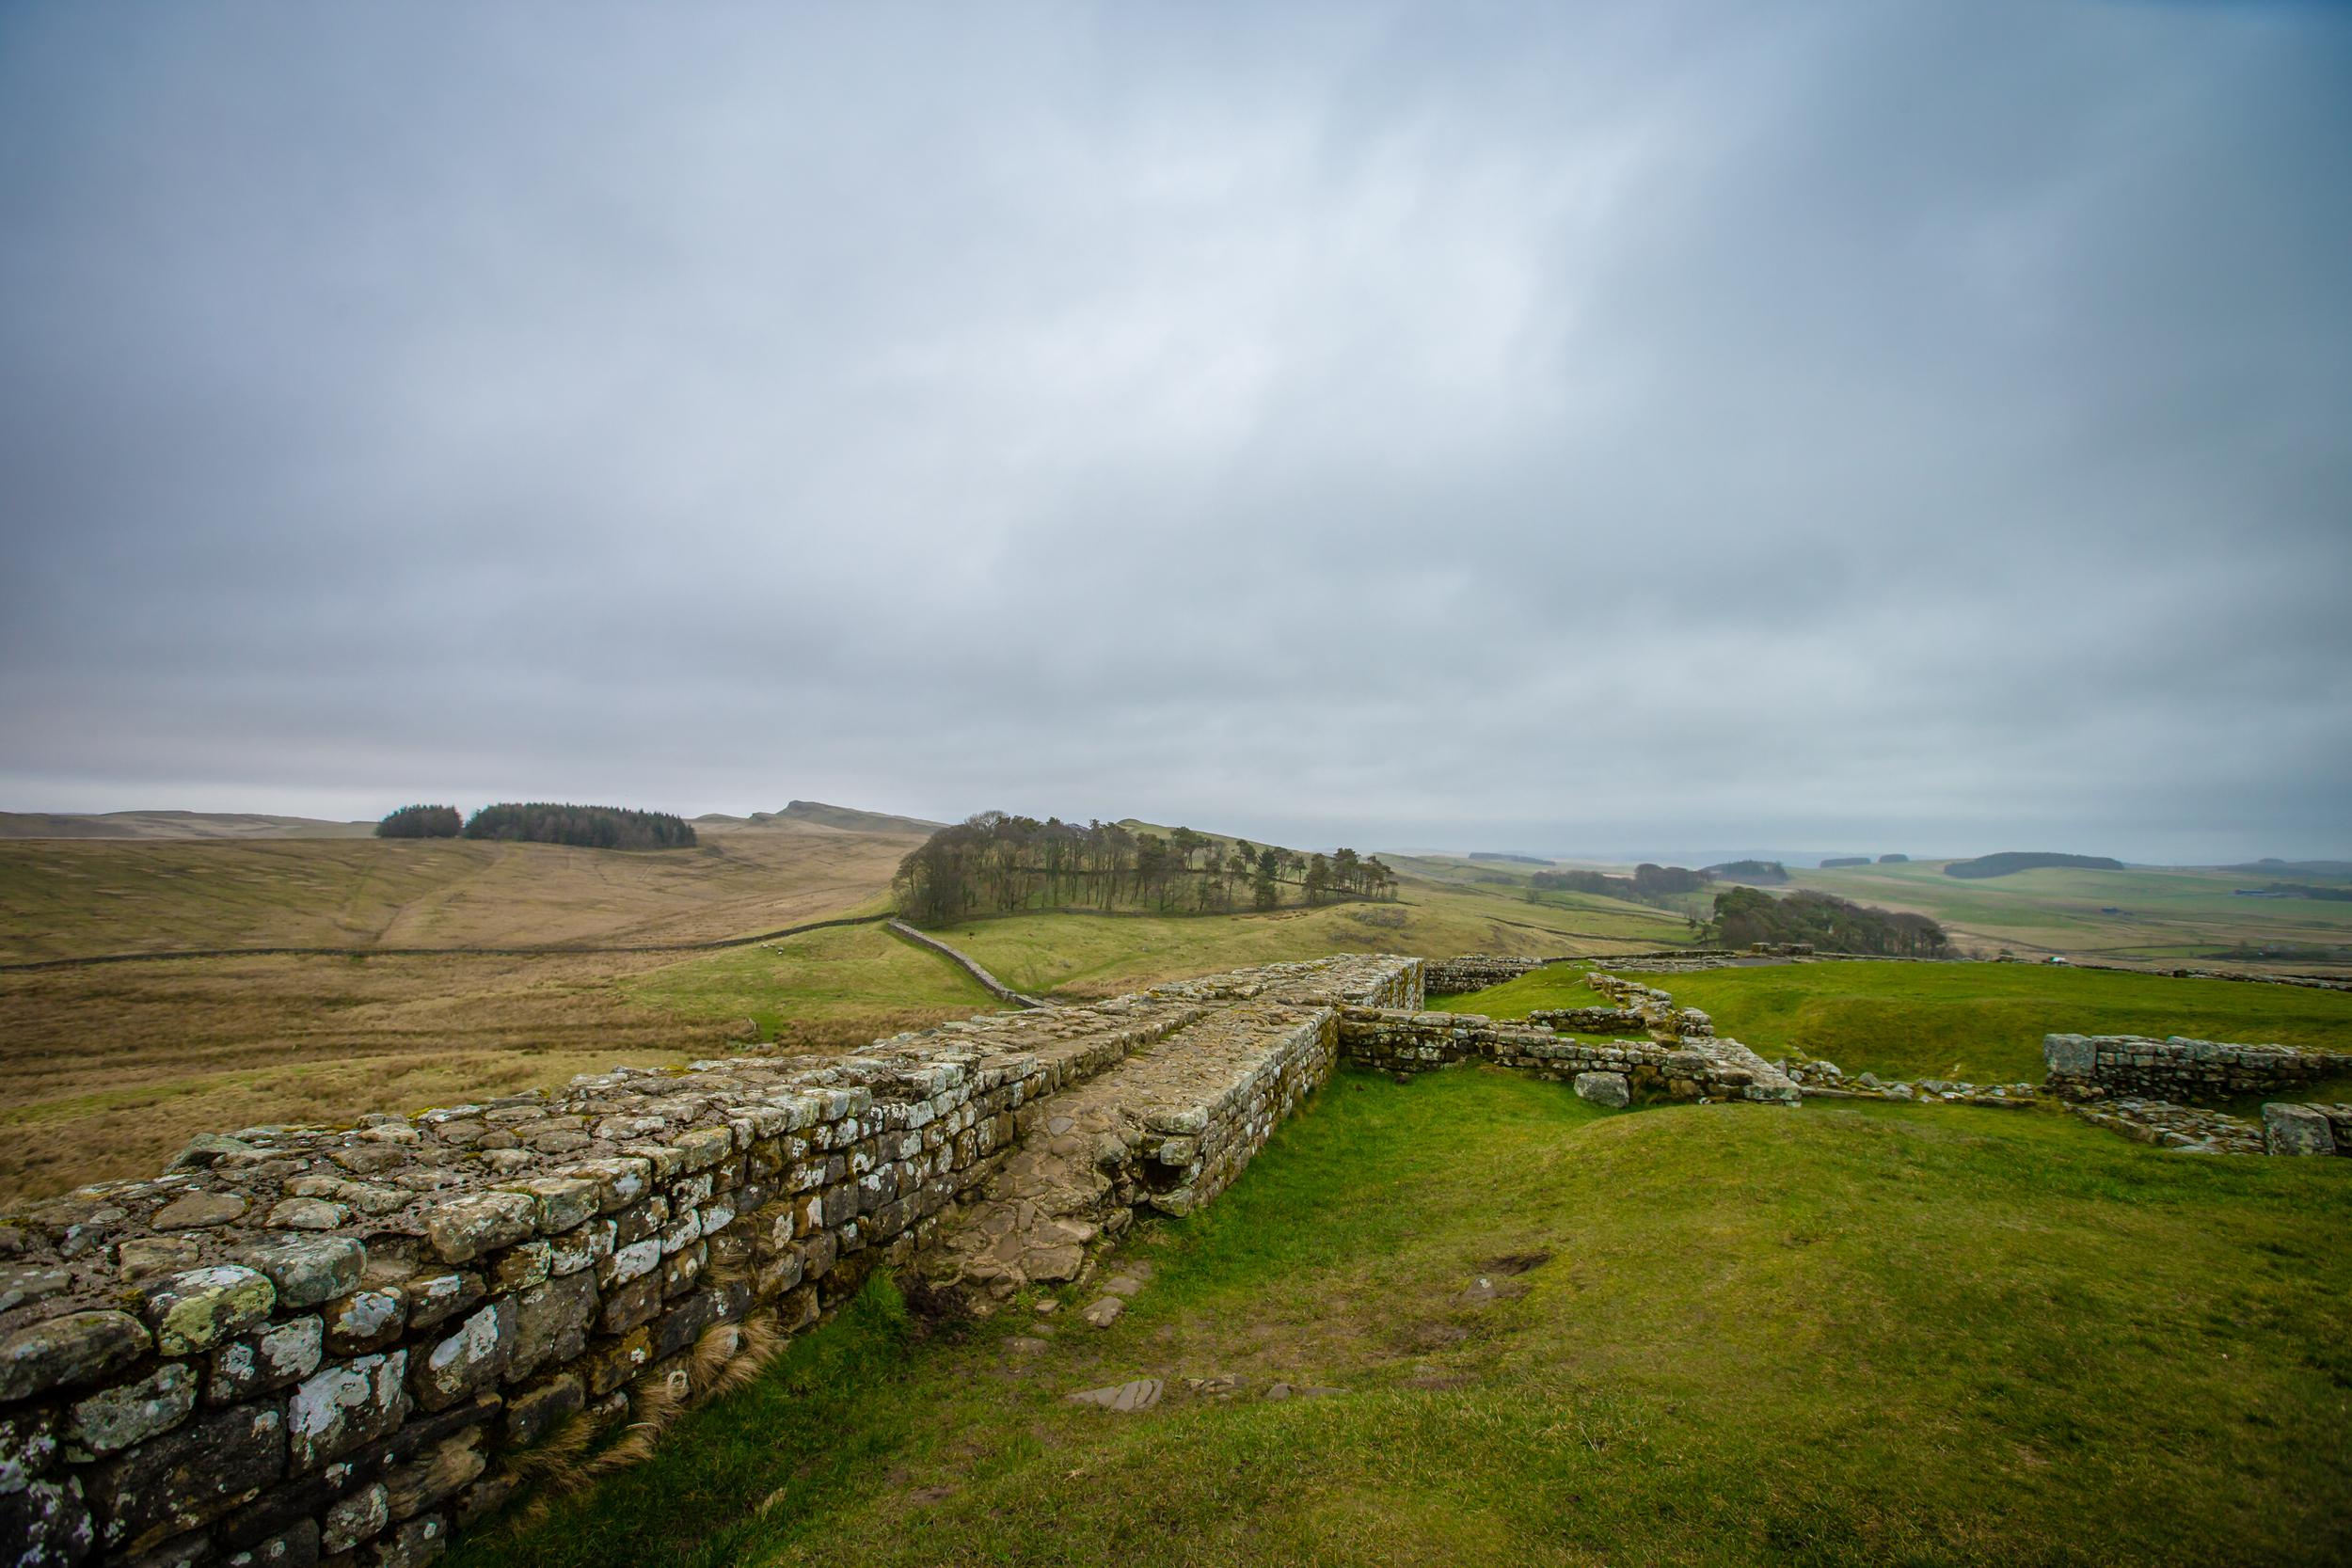 ©Jennifer Bailey 2014 Housesteads Roman Fort, Hadrian's Wall